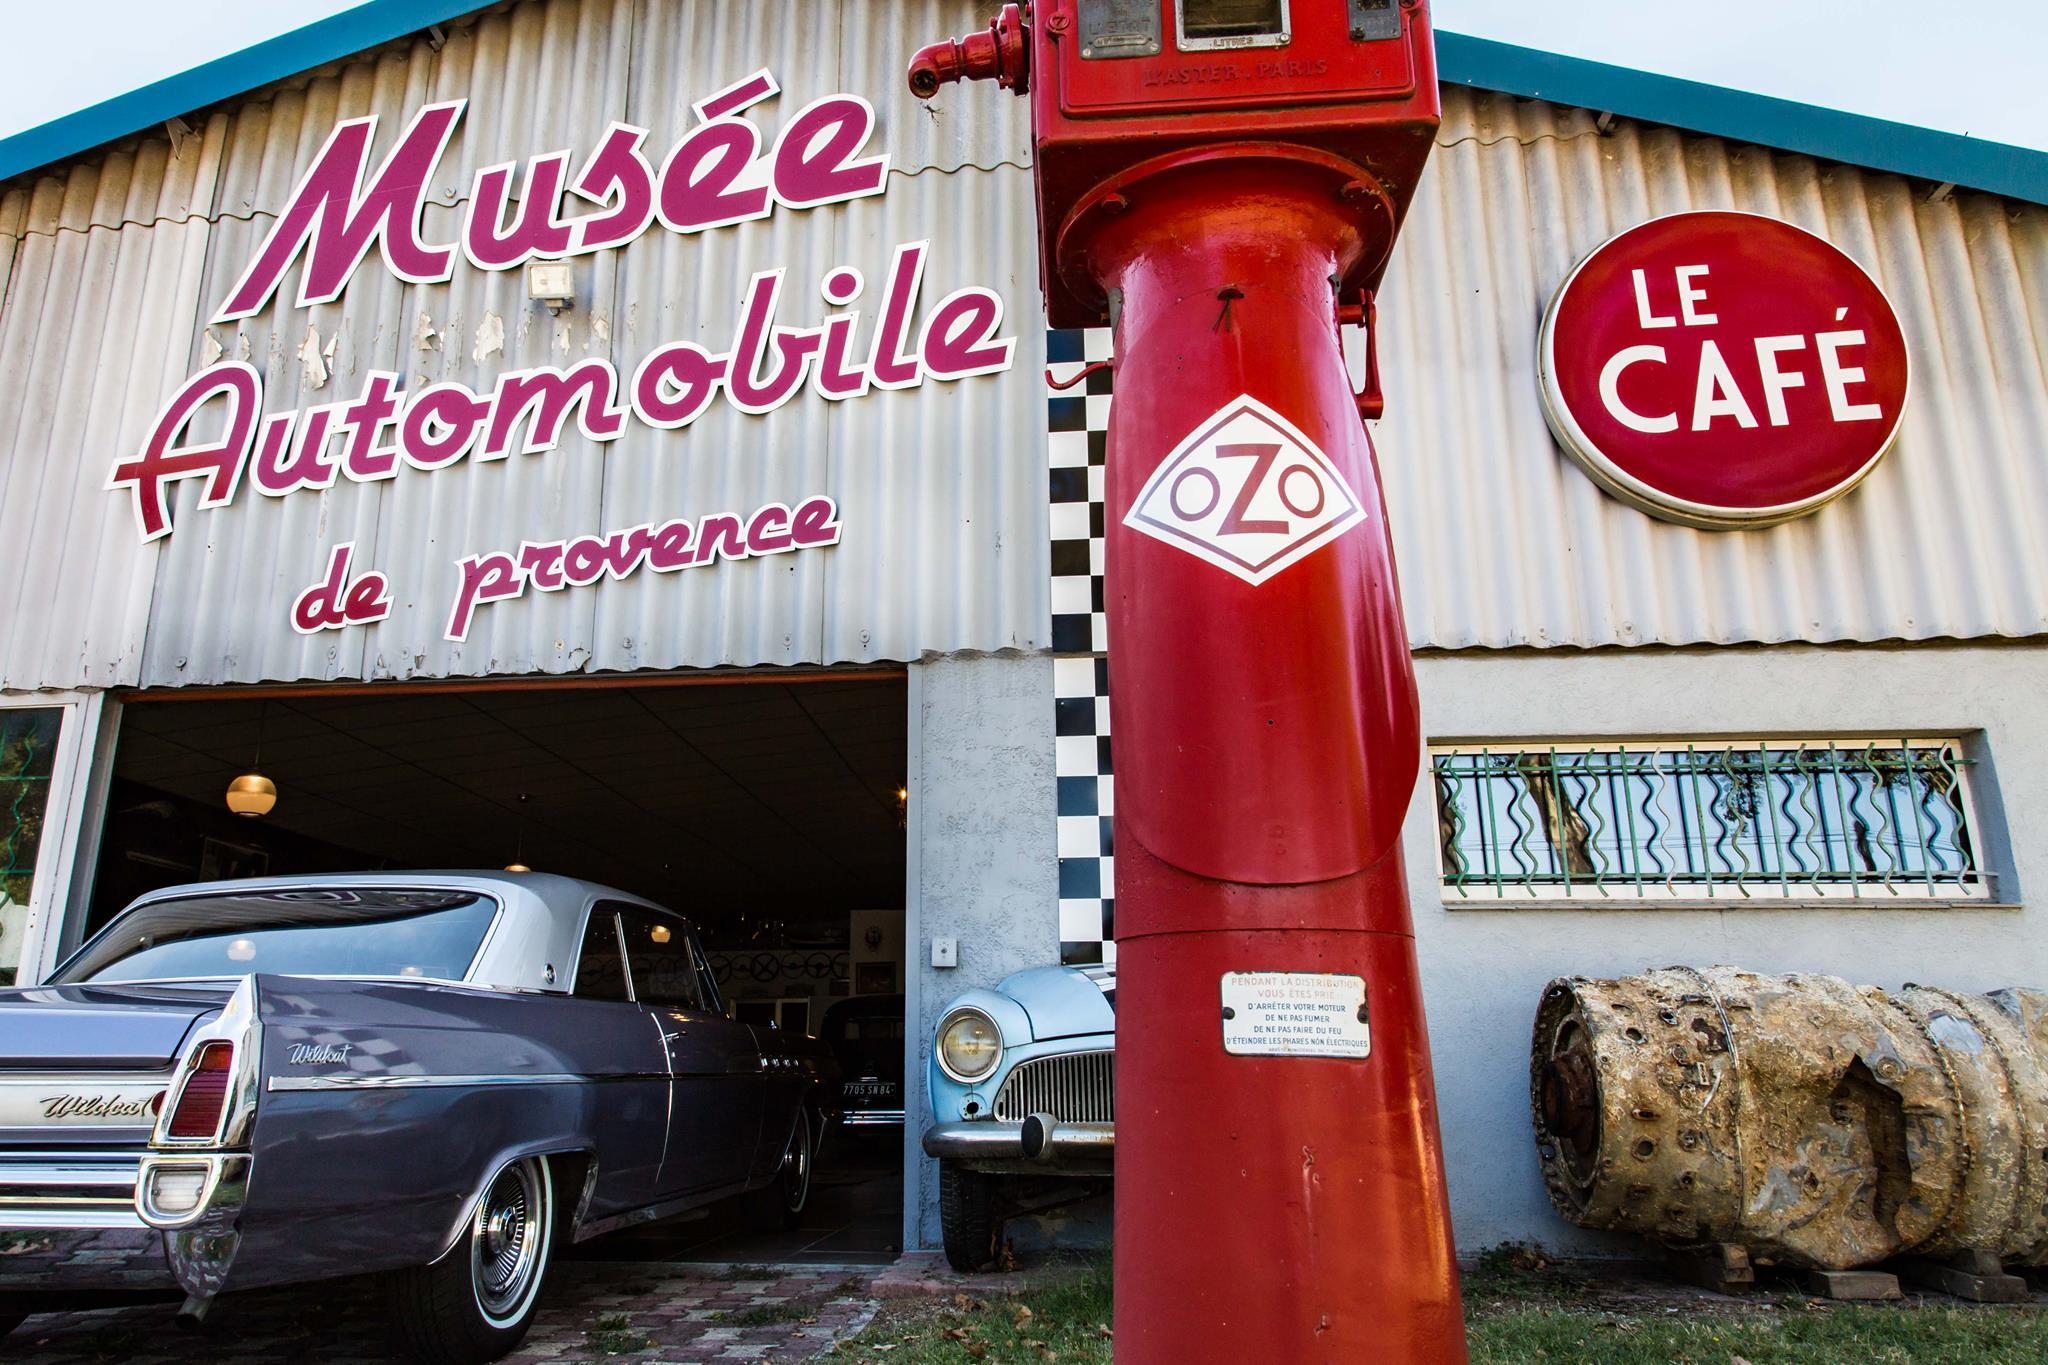 https://lesvoitures.fr/wp-content/uploads/2020/05/musee-automobile-de-provence-1.jpg